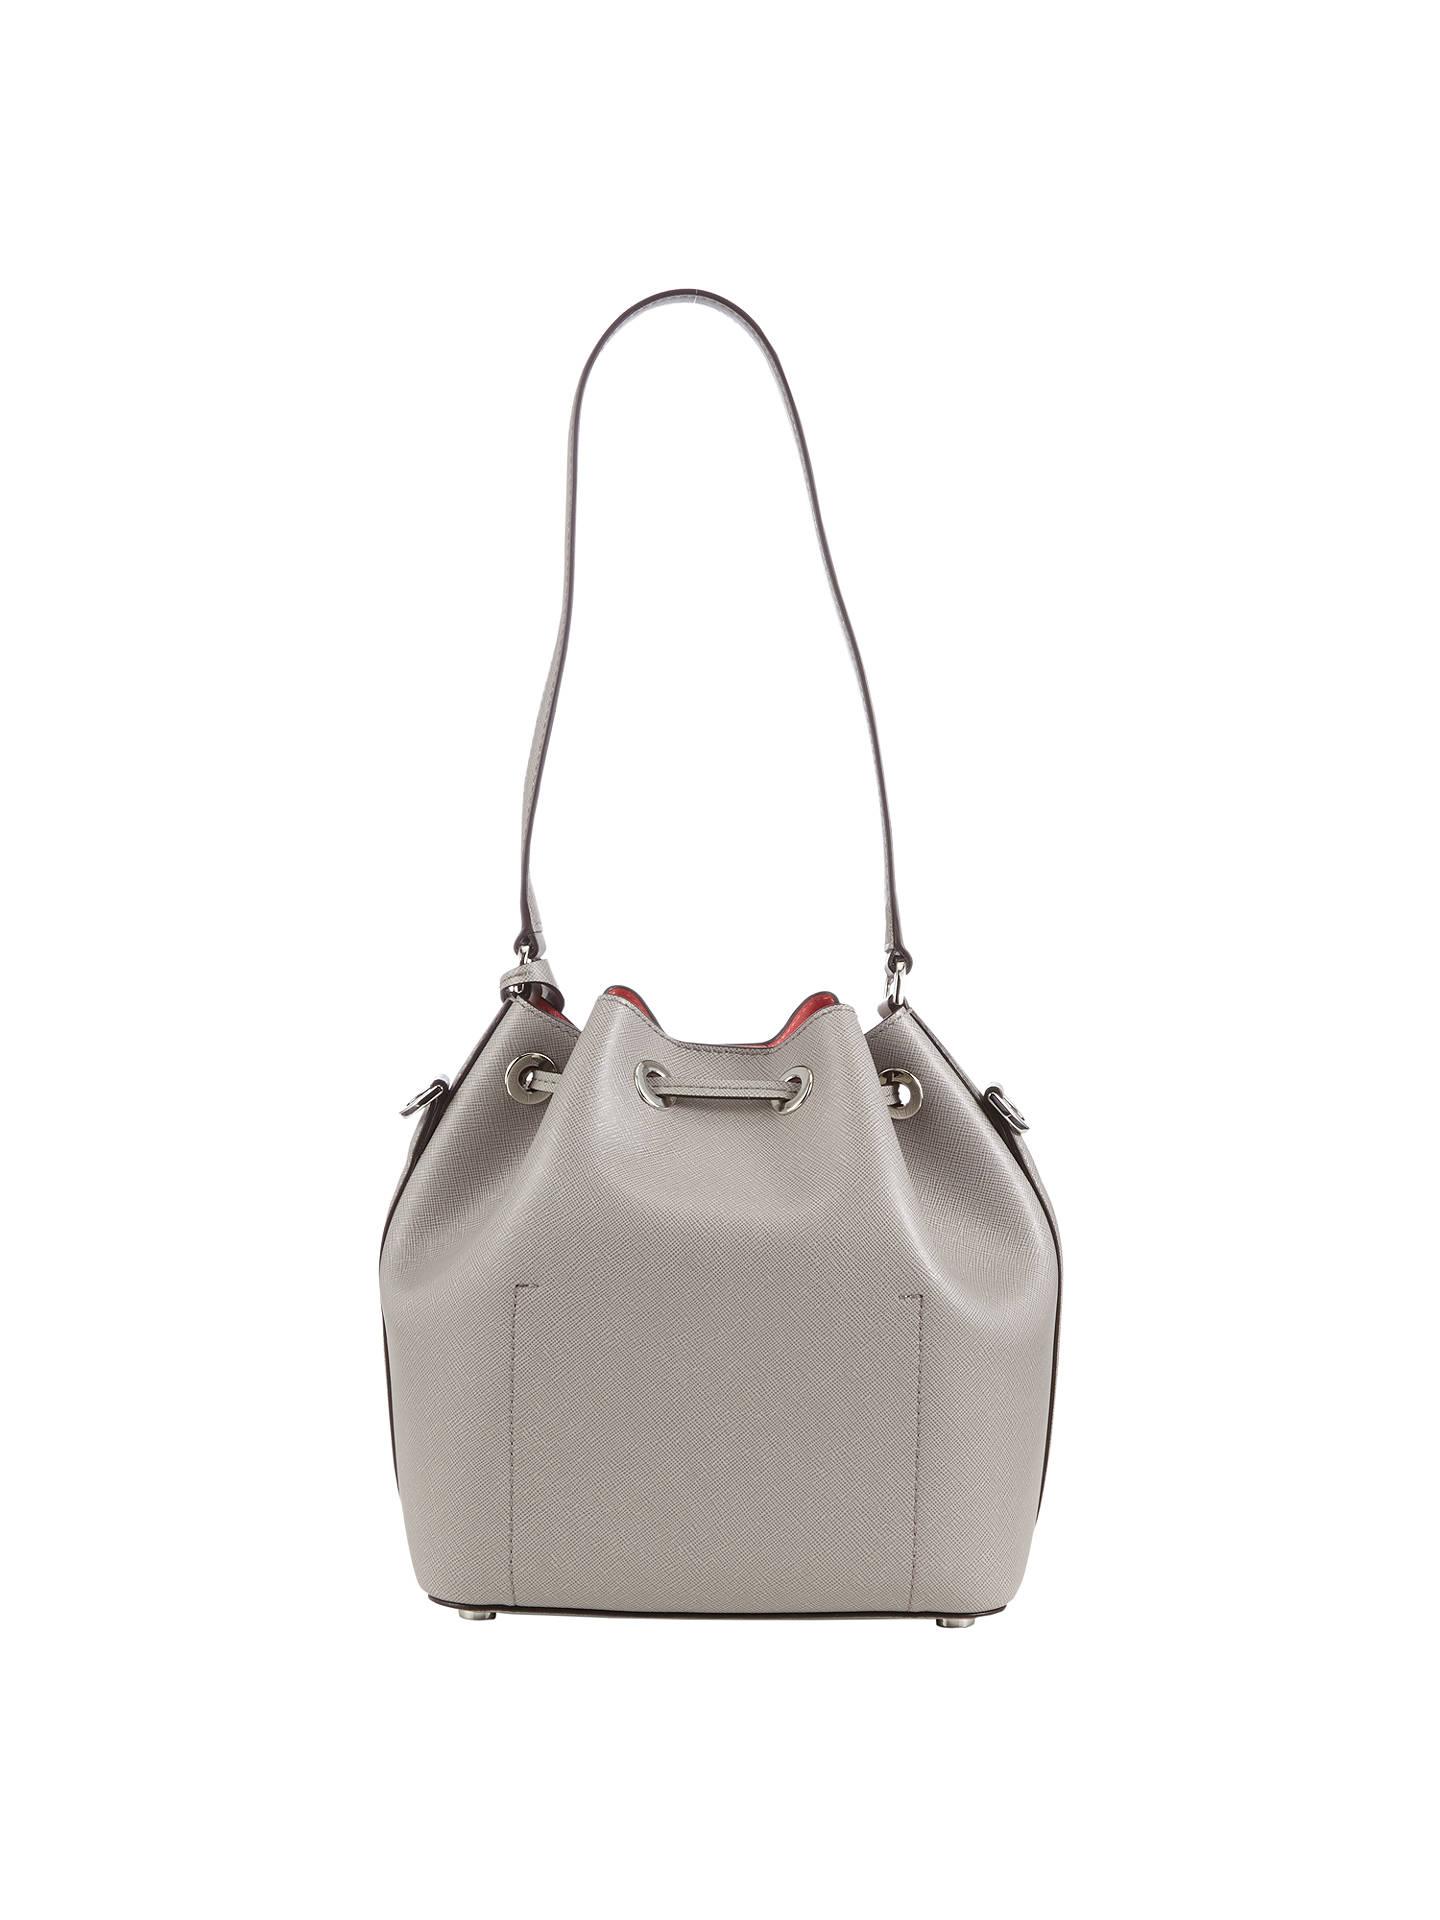 78add3f619 ... Buy MICHAEL Michael Kors Greenwich Medium Bucket Bag